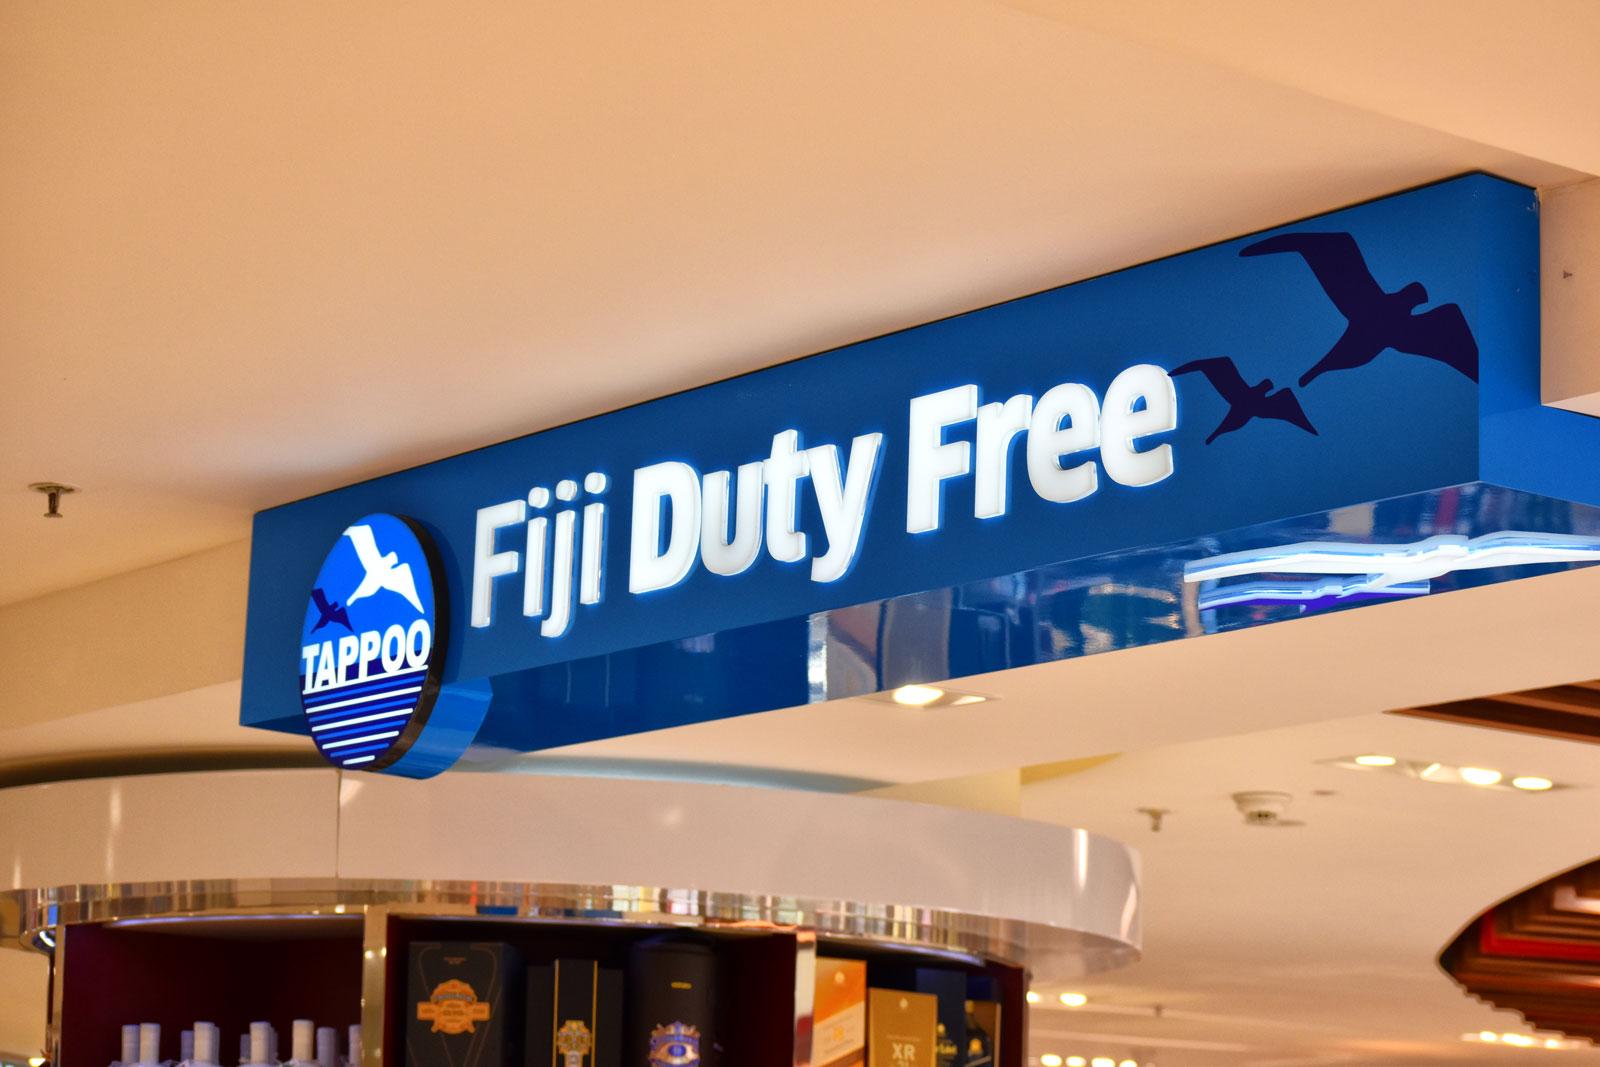 HEADER-duty-free-allowance-for-fiji-Credit-fijipocketguide.com-